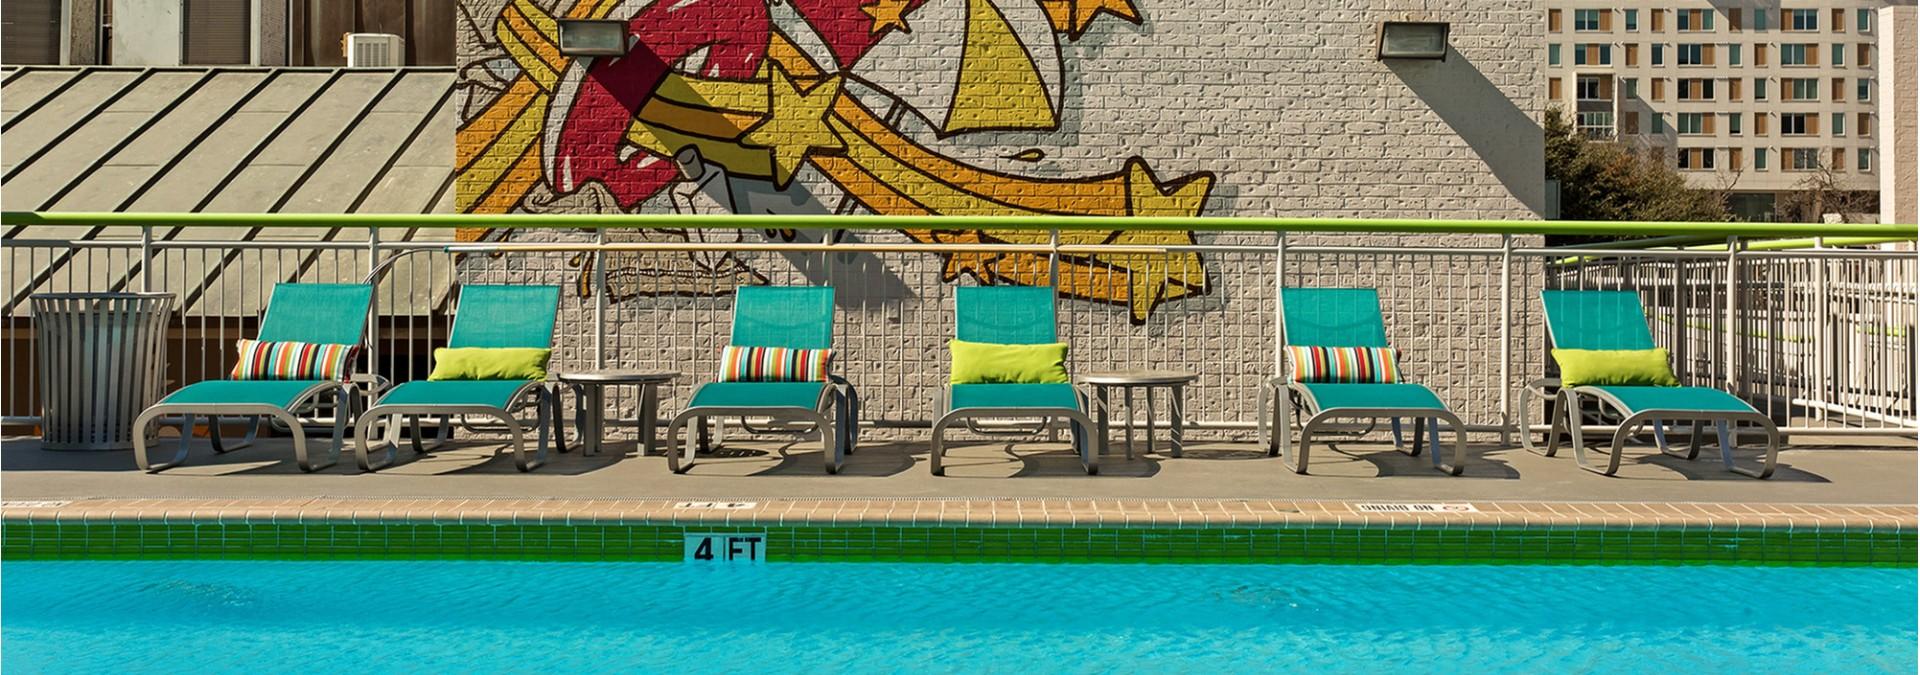 Swimming Pool at Dobie Twenty21 Student Spaces 2